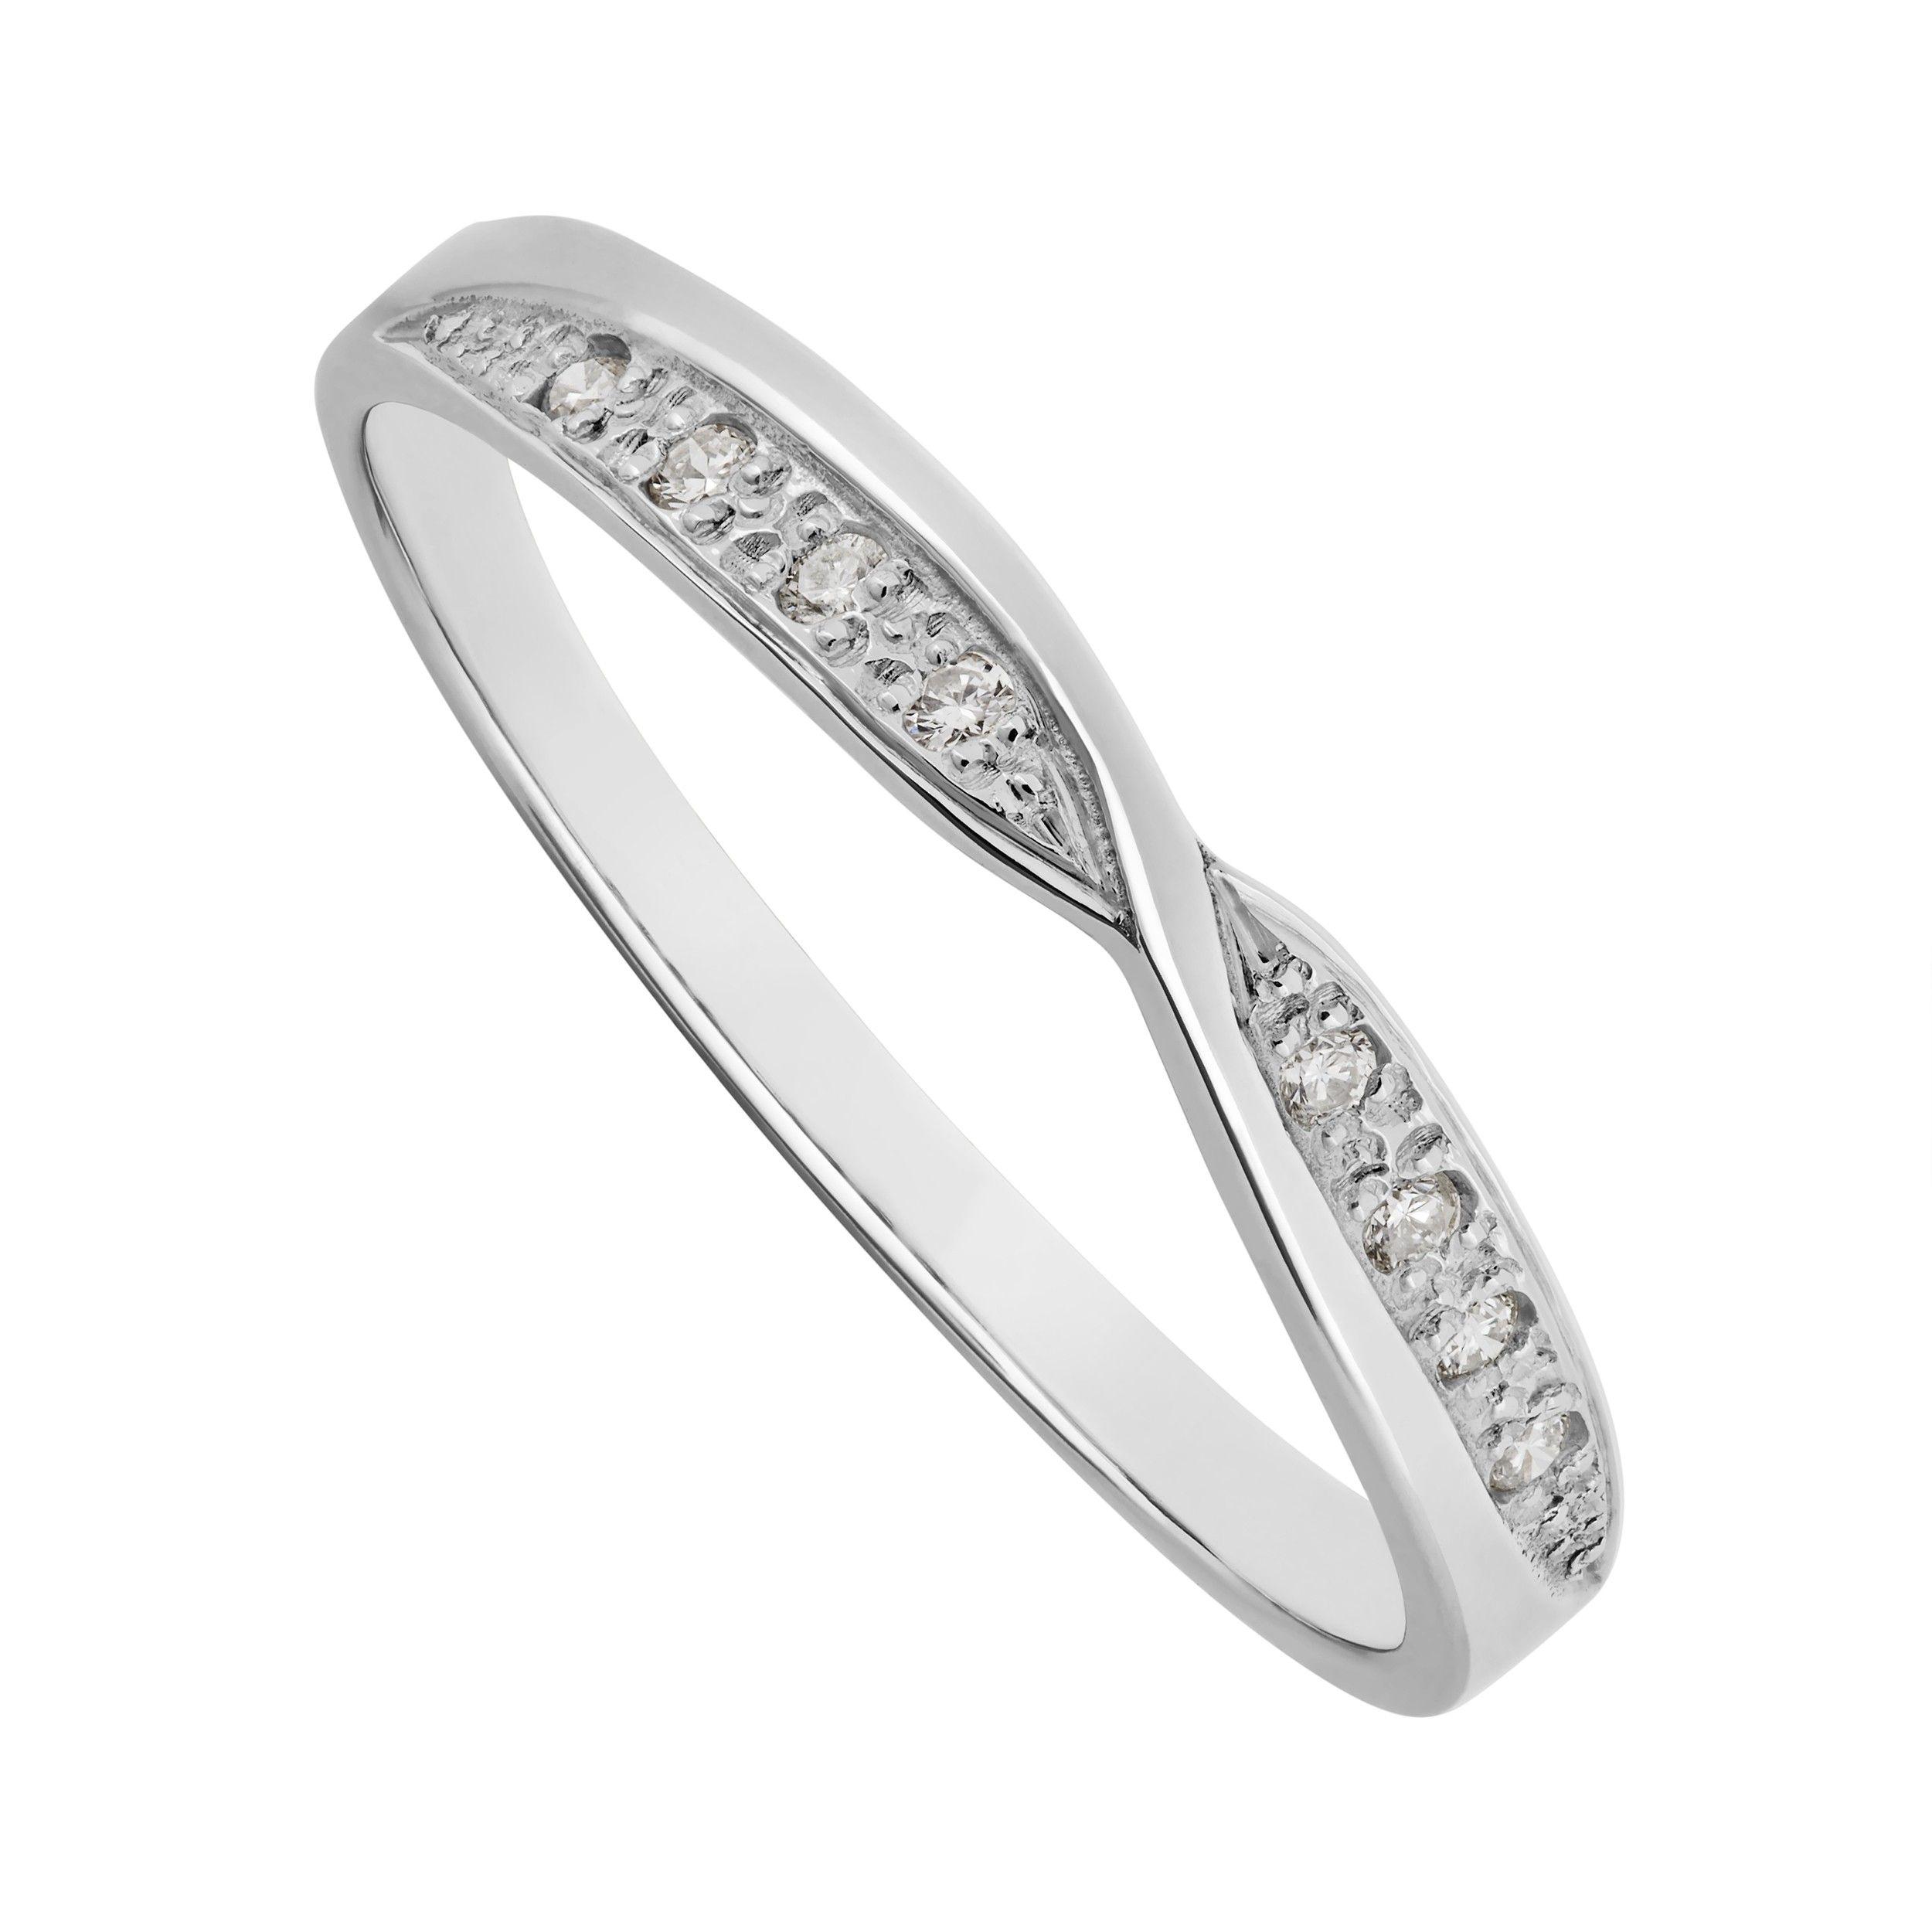 Ladies 18ct white gold diamond shaped crossover wedding ring